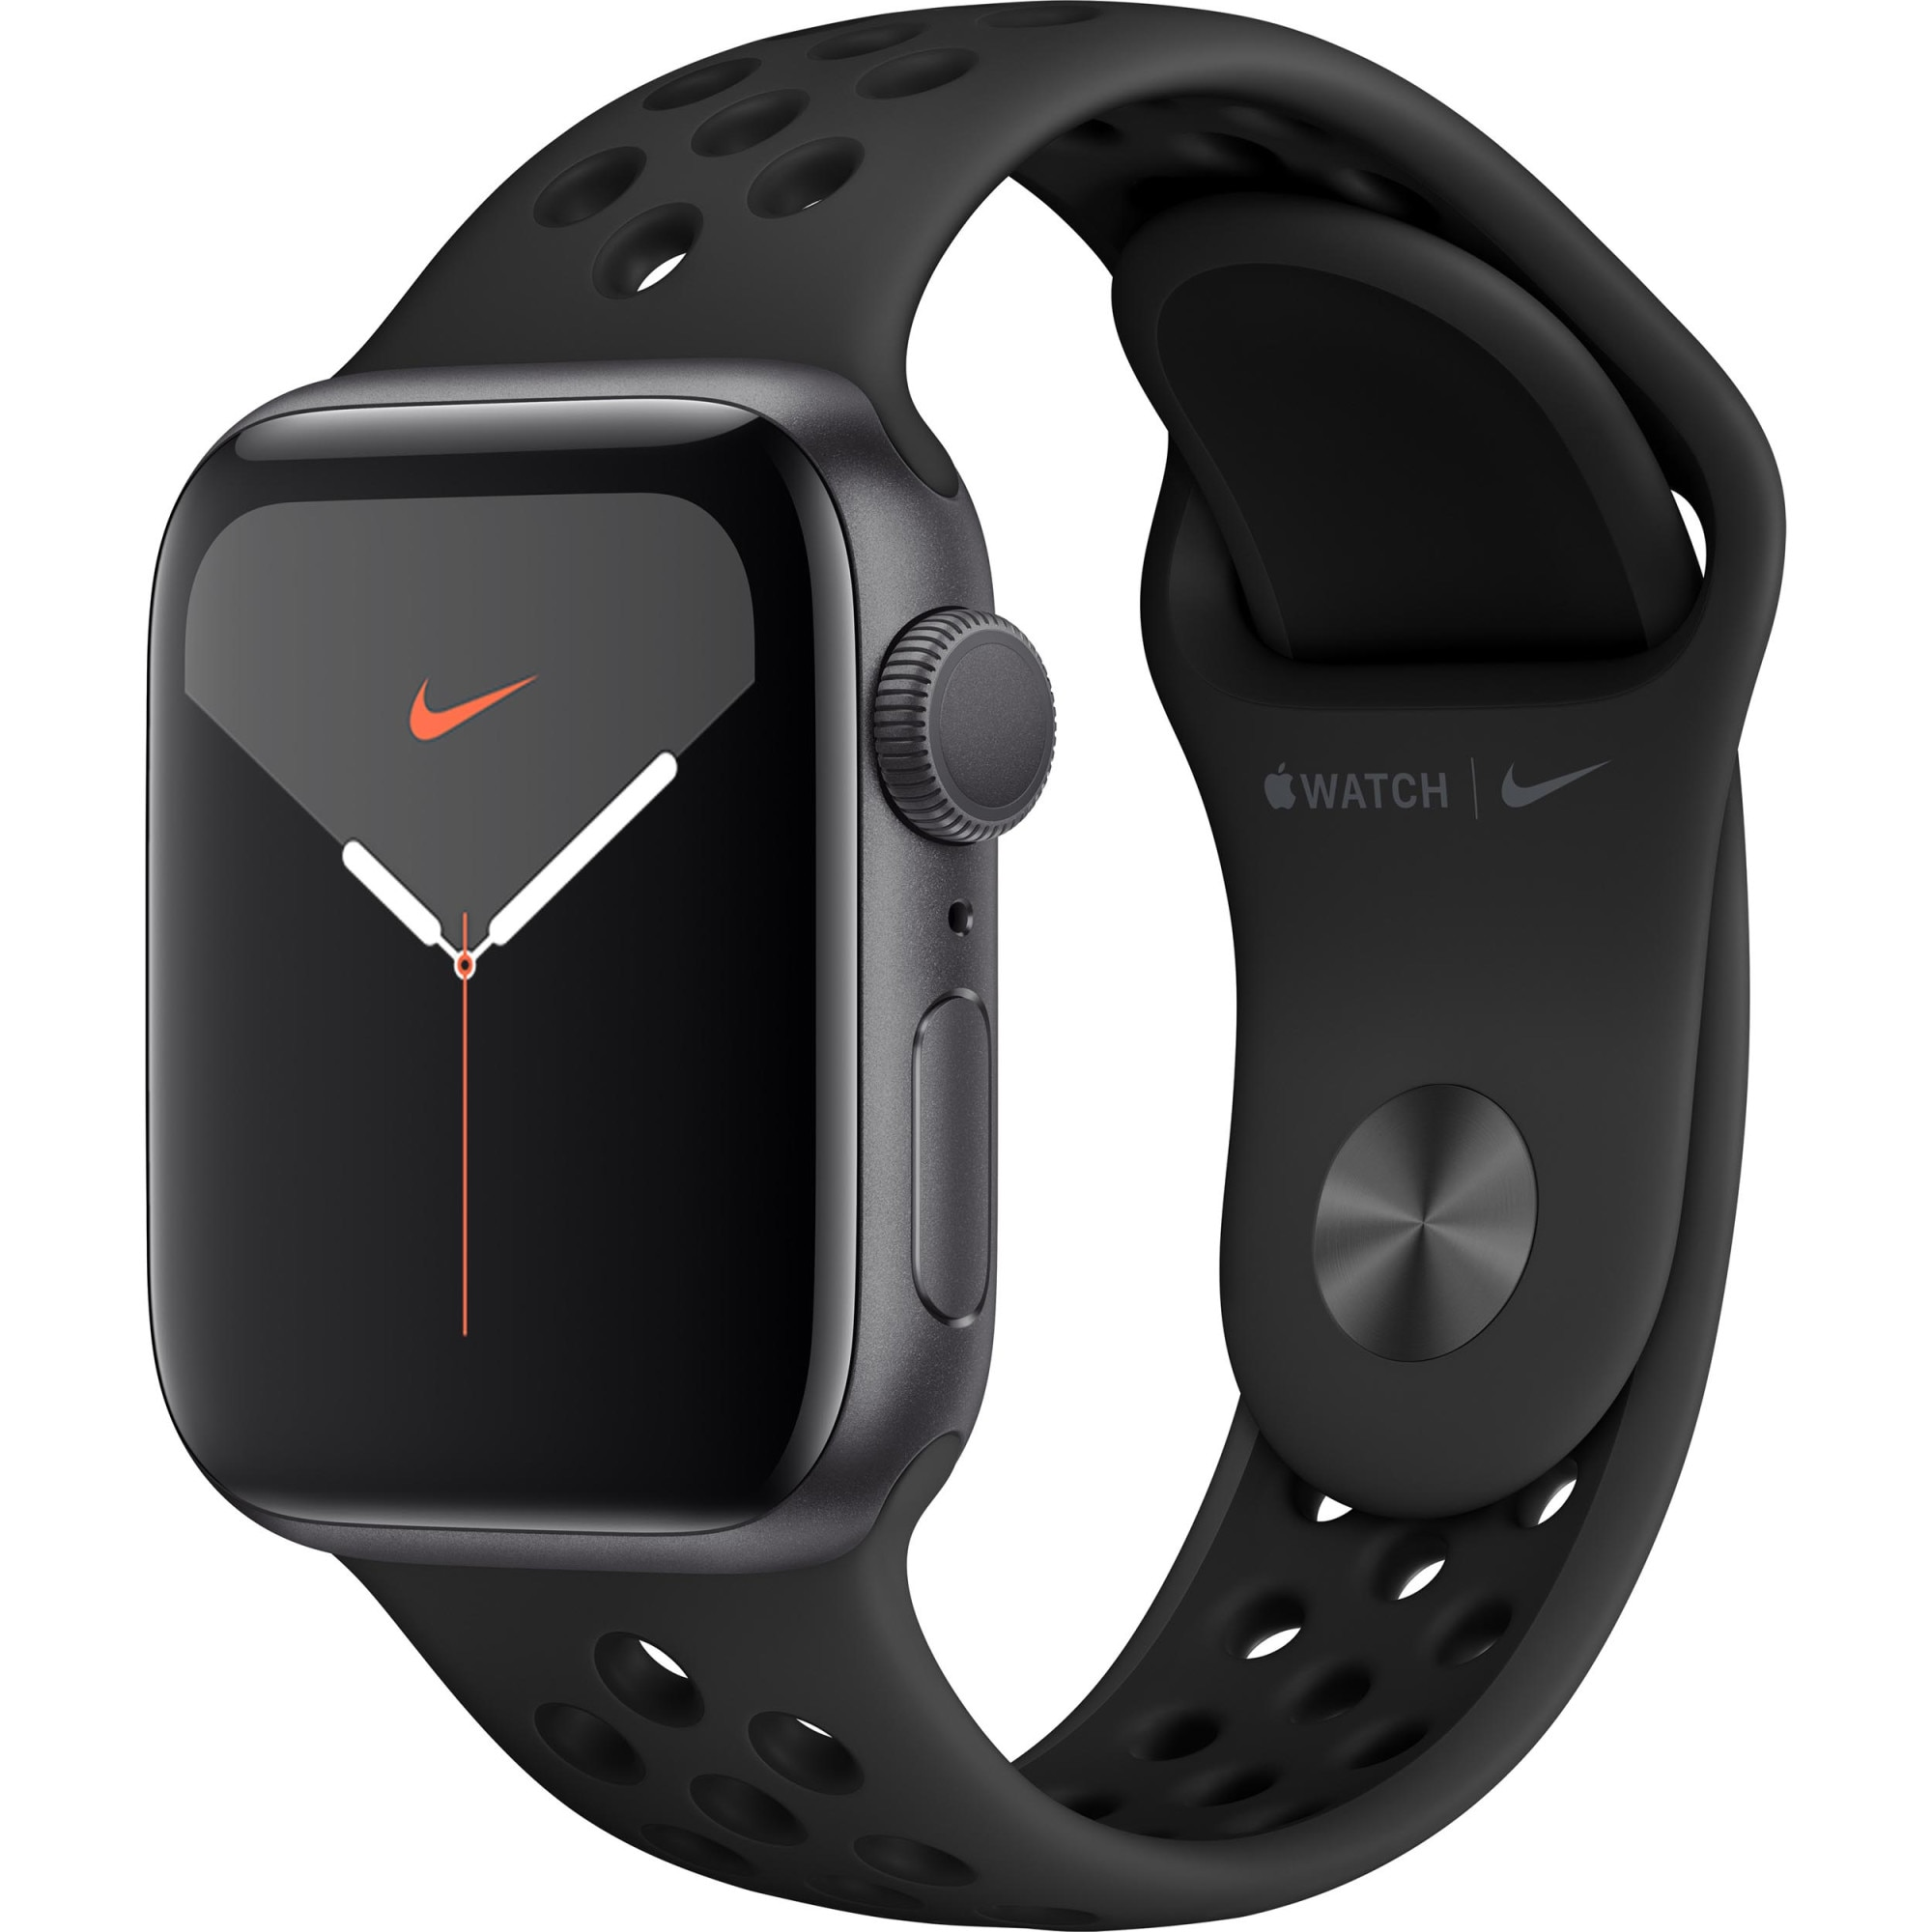 Fotografie Apple Watch Nike 5, GPS, Carcasa Space Grey Aluminium 44mm, Anthracite/Black Nike Sport Band - S/M & M/L